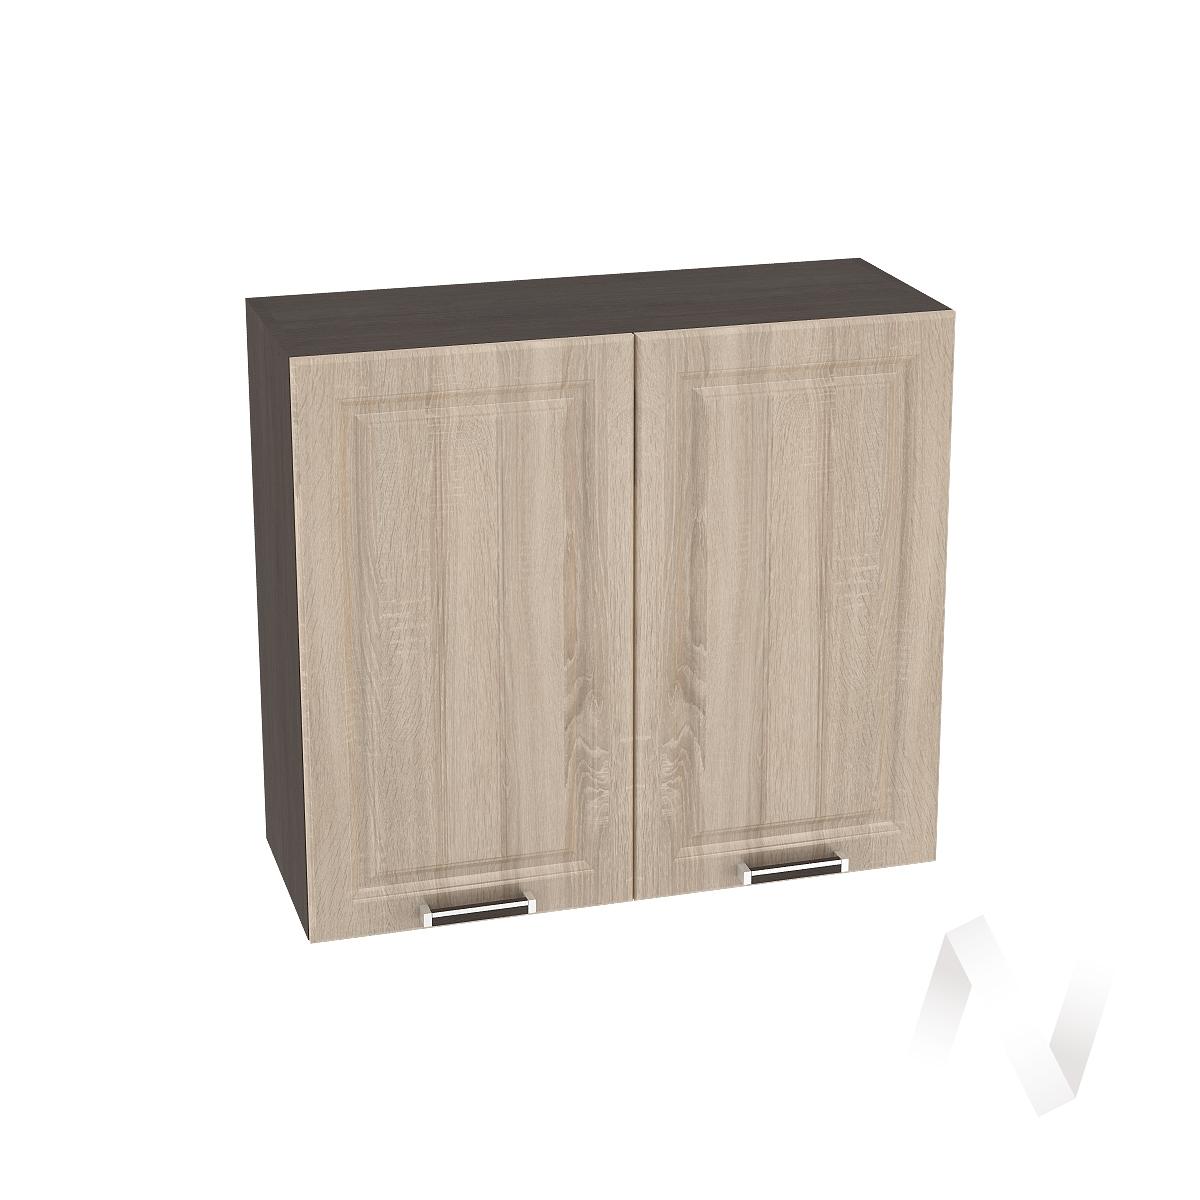 "Кухня ""Прага"": Шкаф верхний 800, ШВ 800 (дуб сонома/корпус венге)"